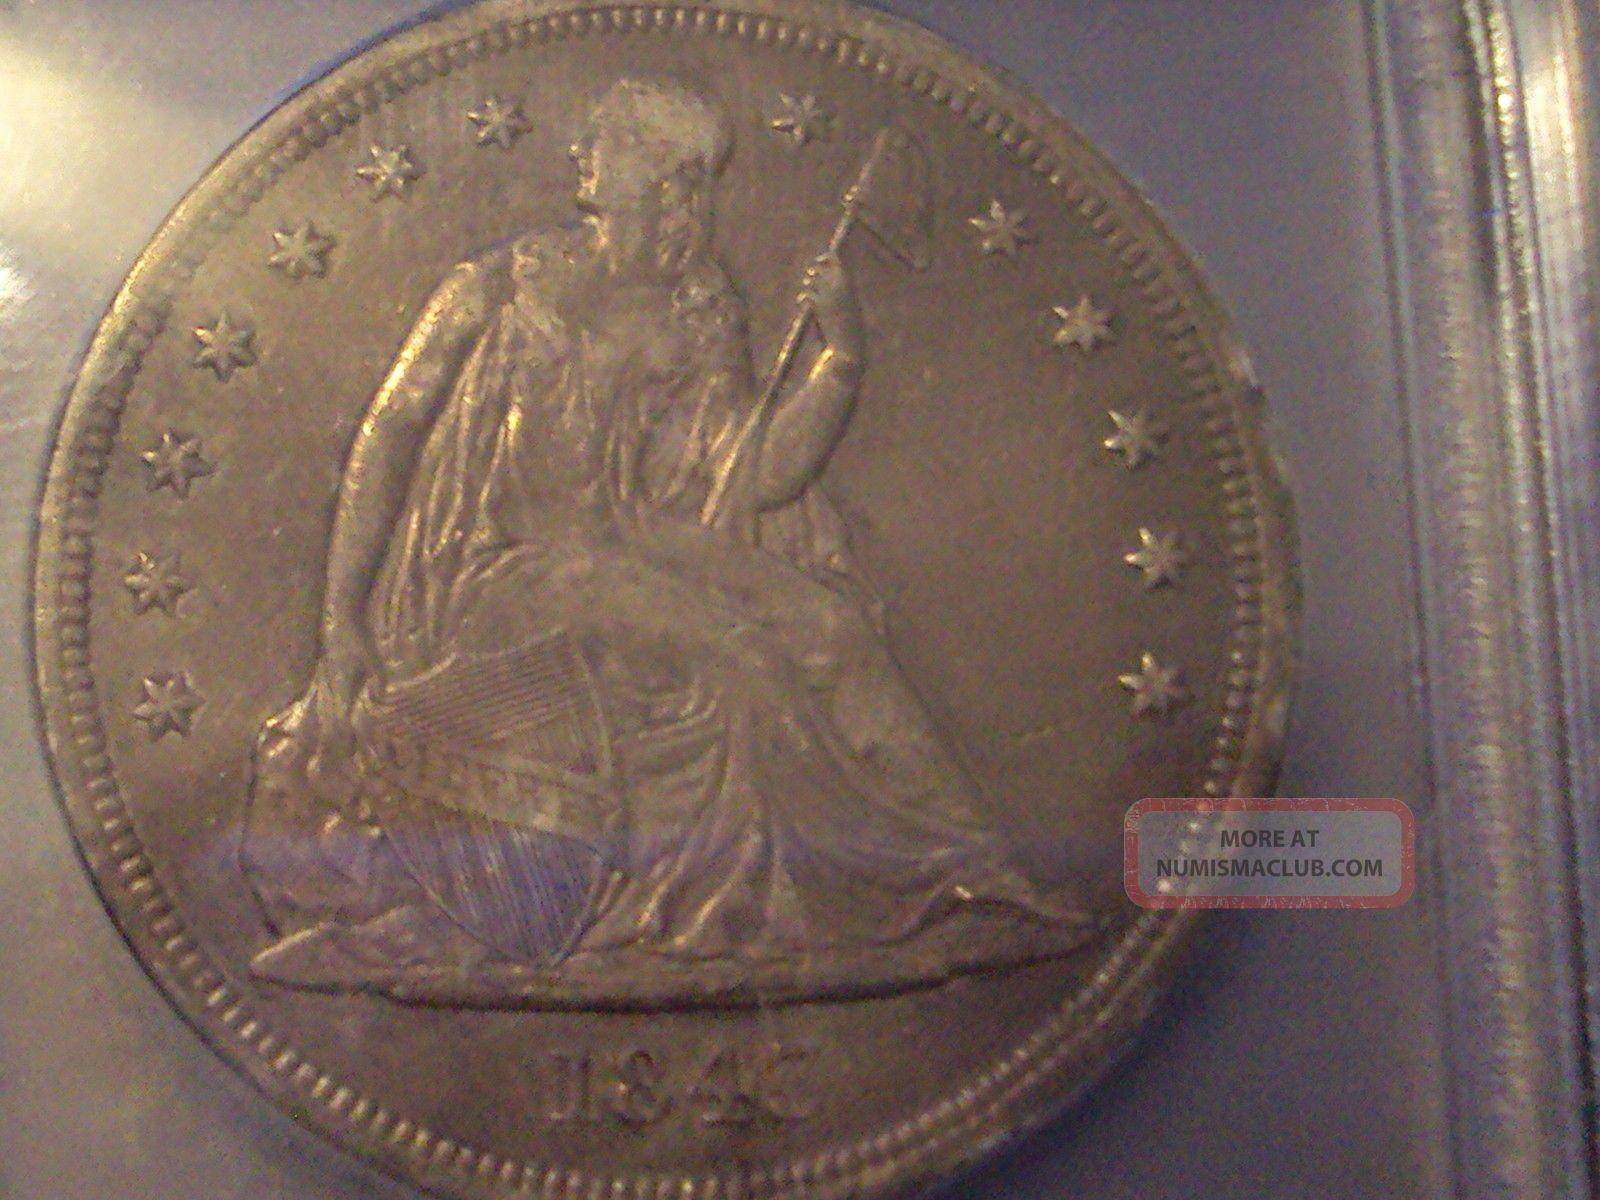 Coinhunters - 1843 Seated Liberty Dollar - Icg Ef 45 - Borderline Au Dollars photo